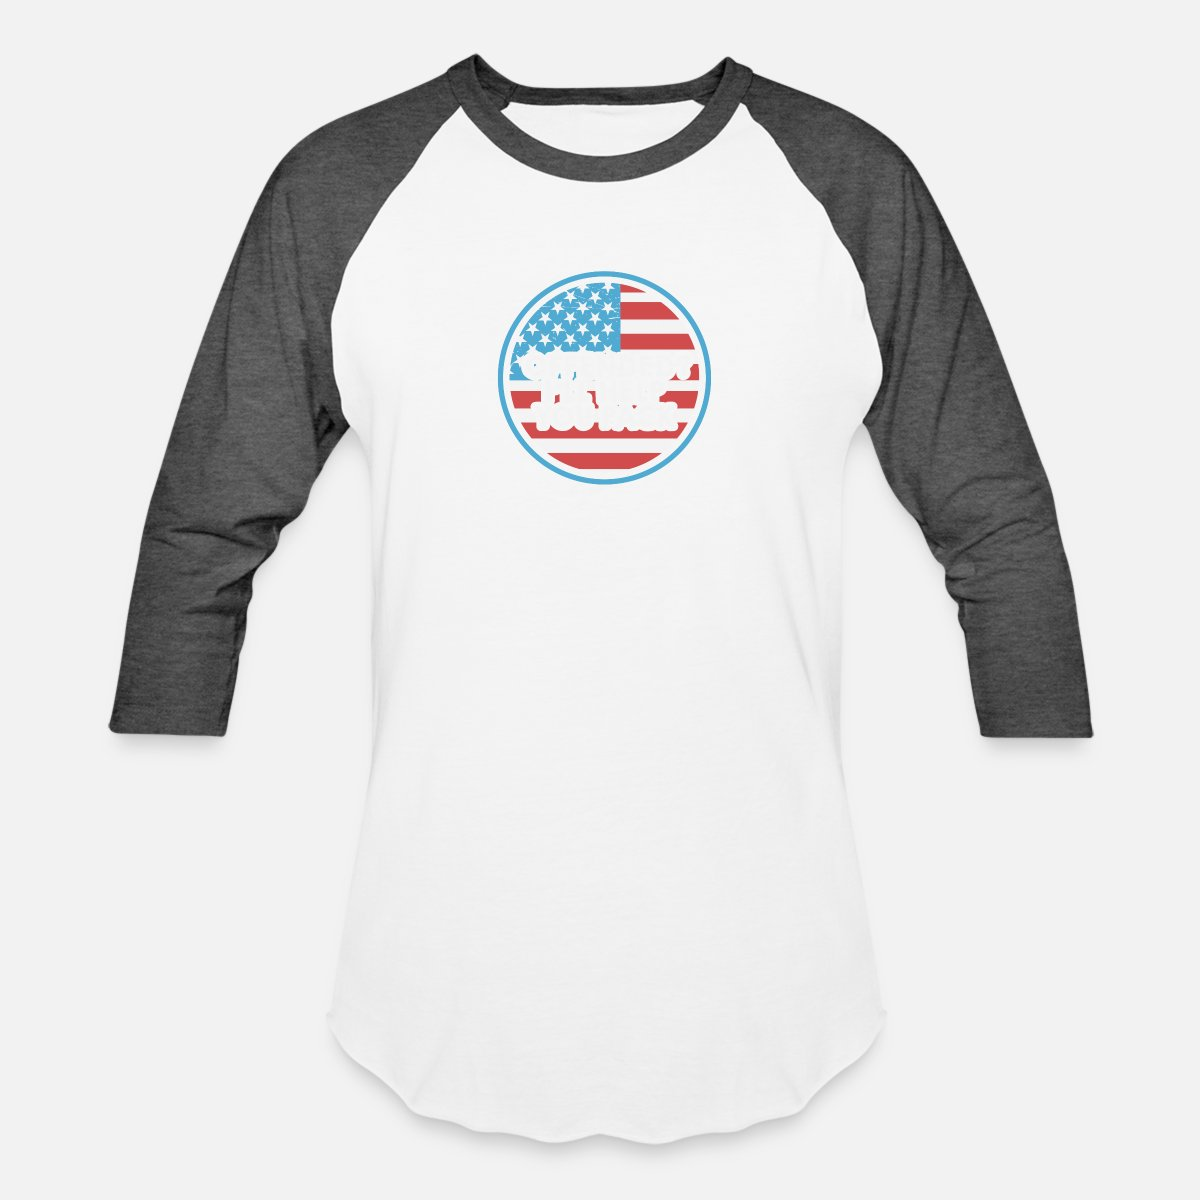 6ef46b384 funny political tshirts - anti liberal by Lhphotos | Spreadshirt